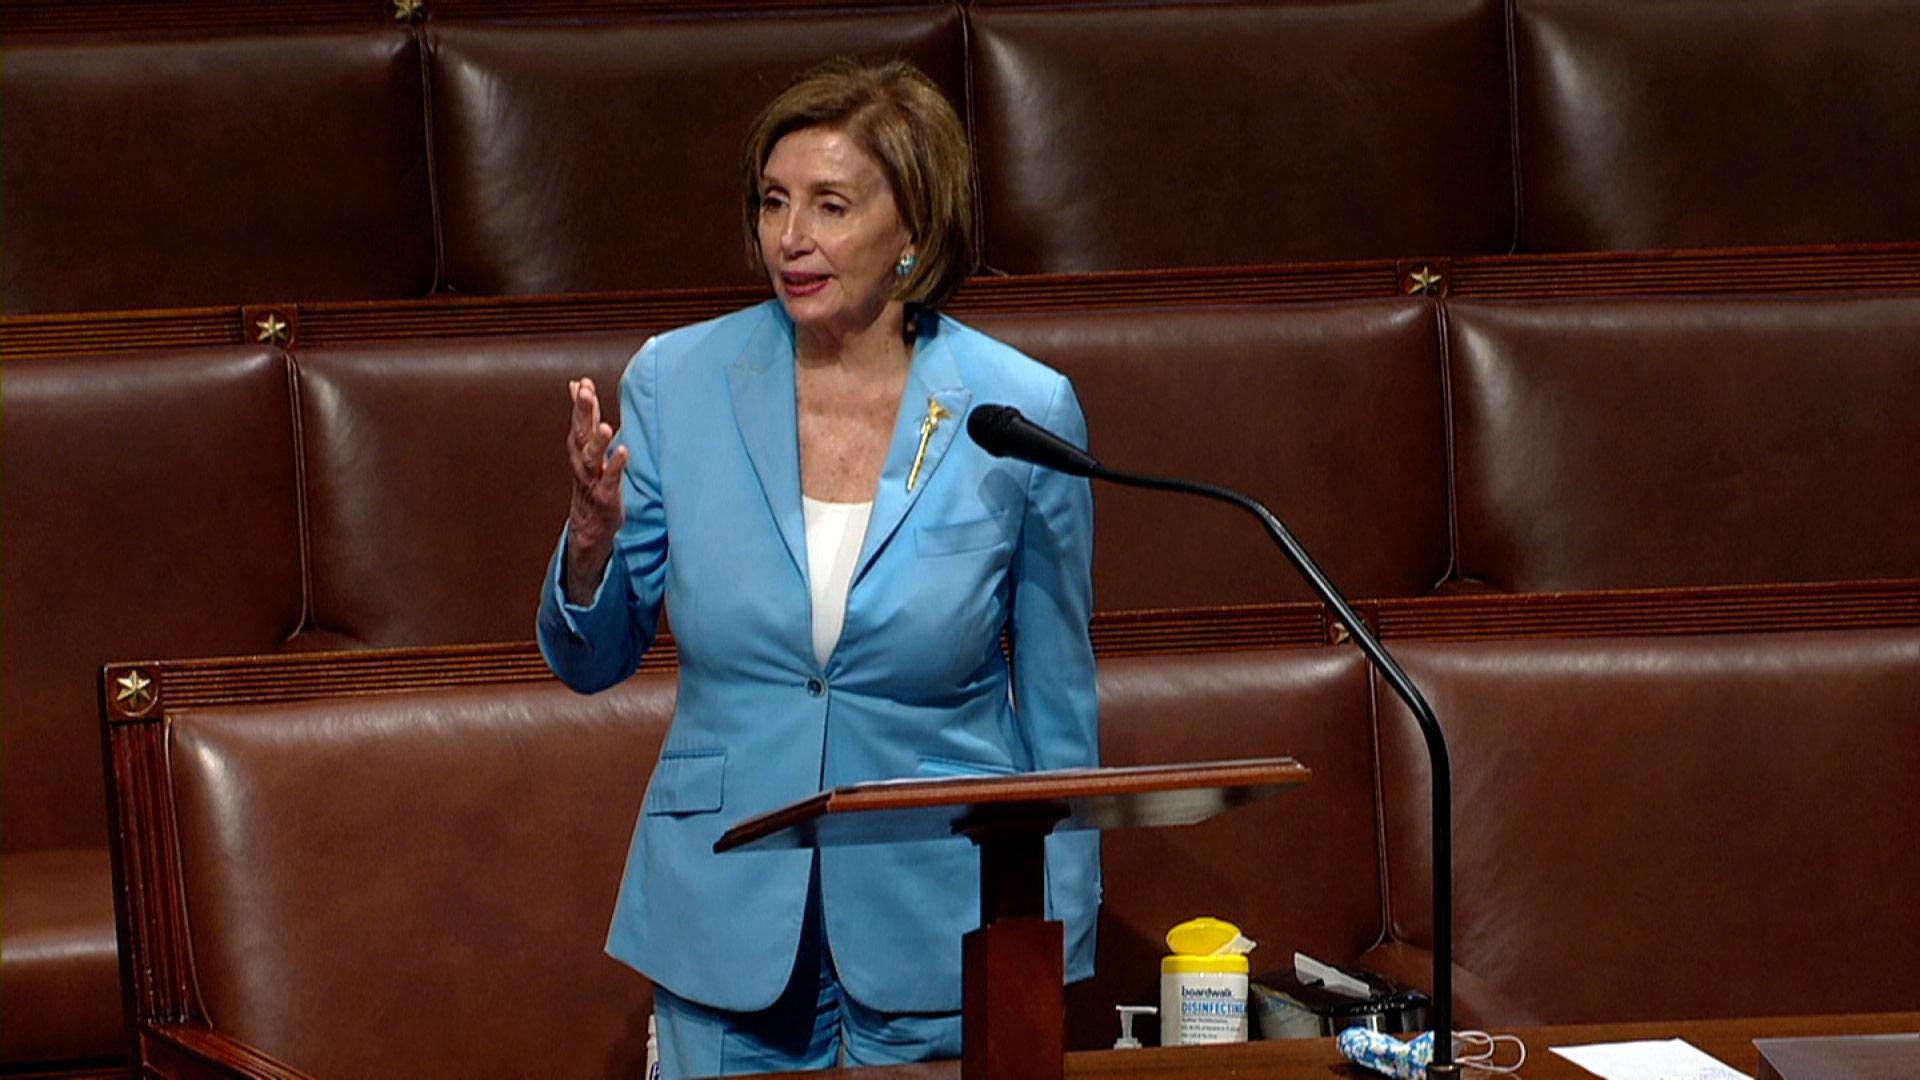 House Speaker Nancy Pelosi speaks on the House floor on Wednesday, May 19, in Washington, DC.